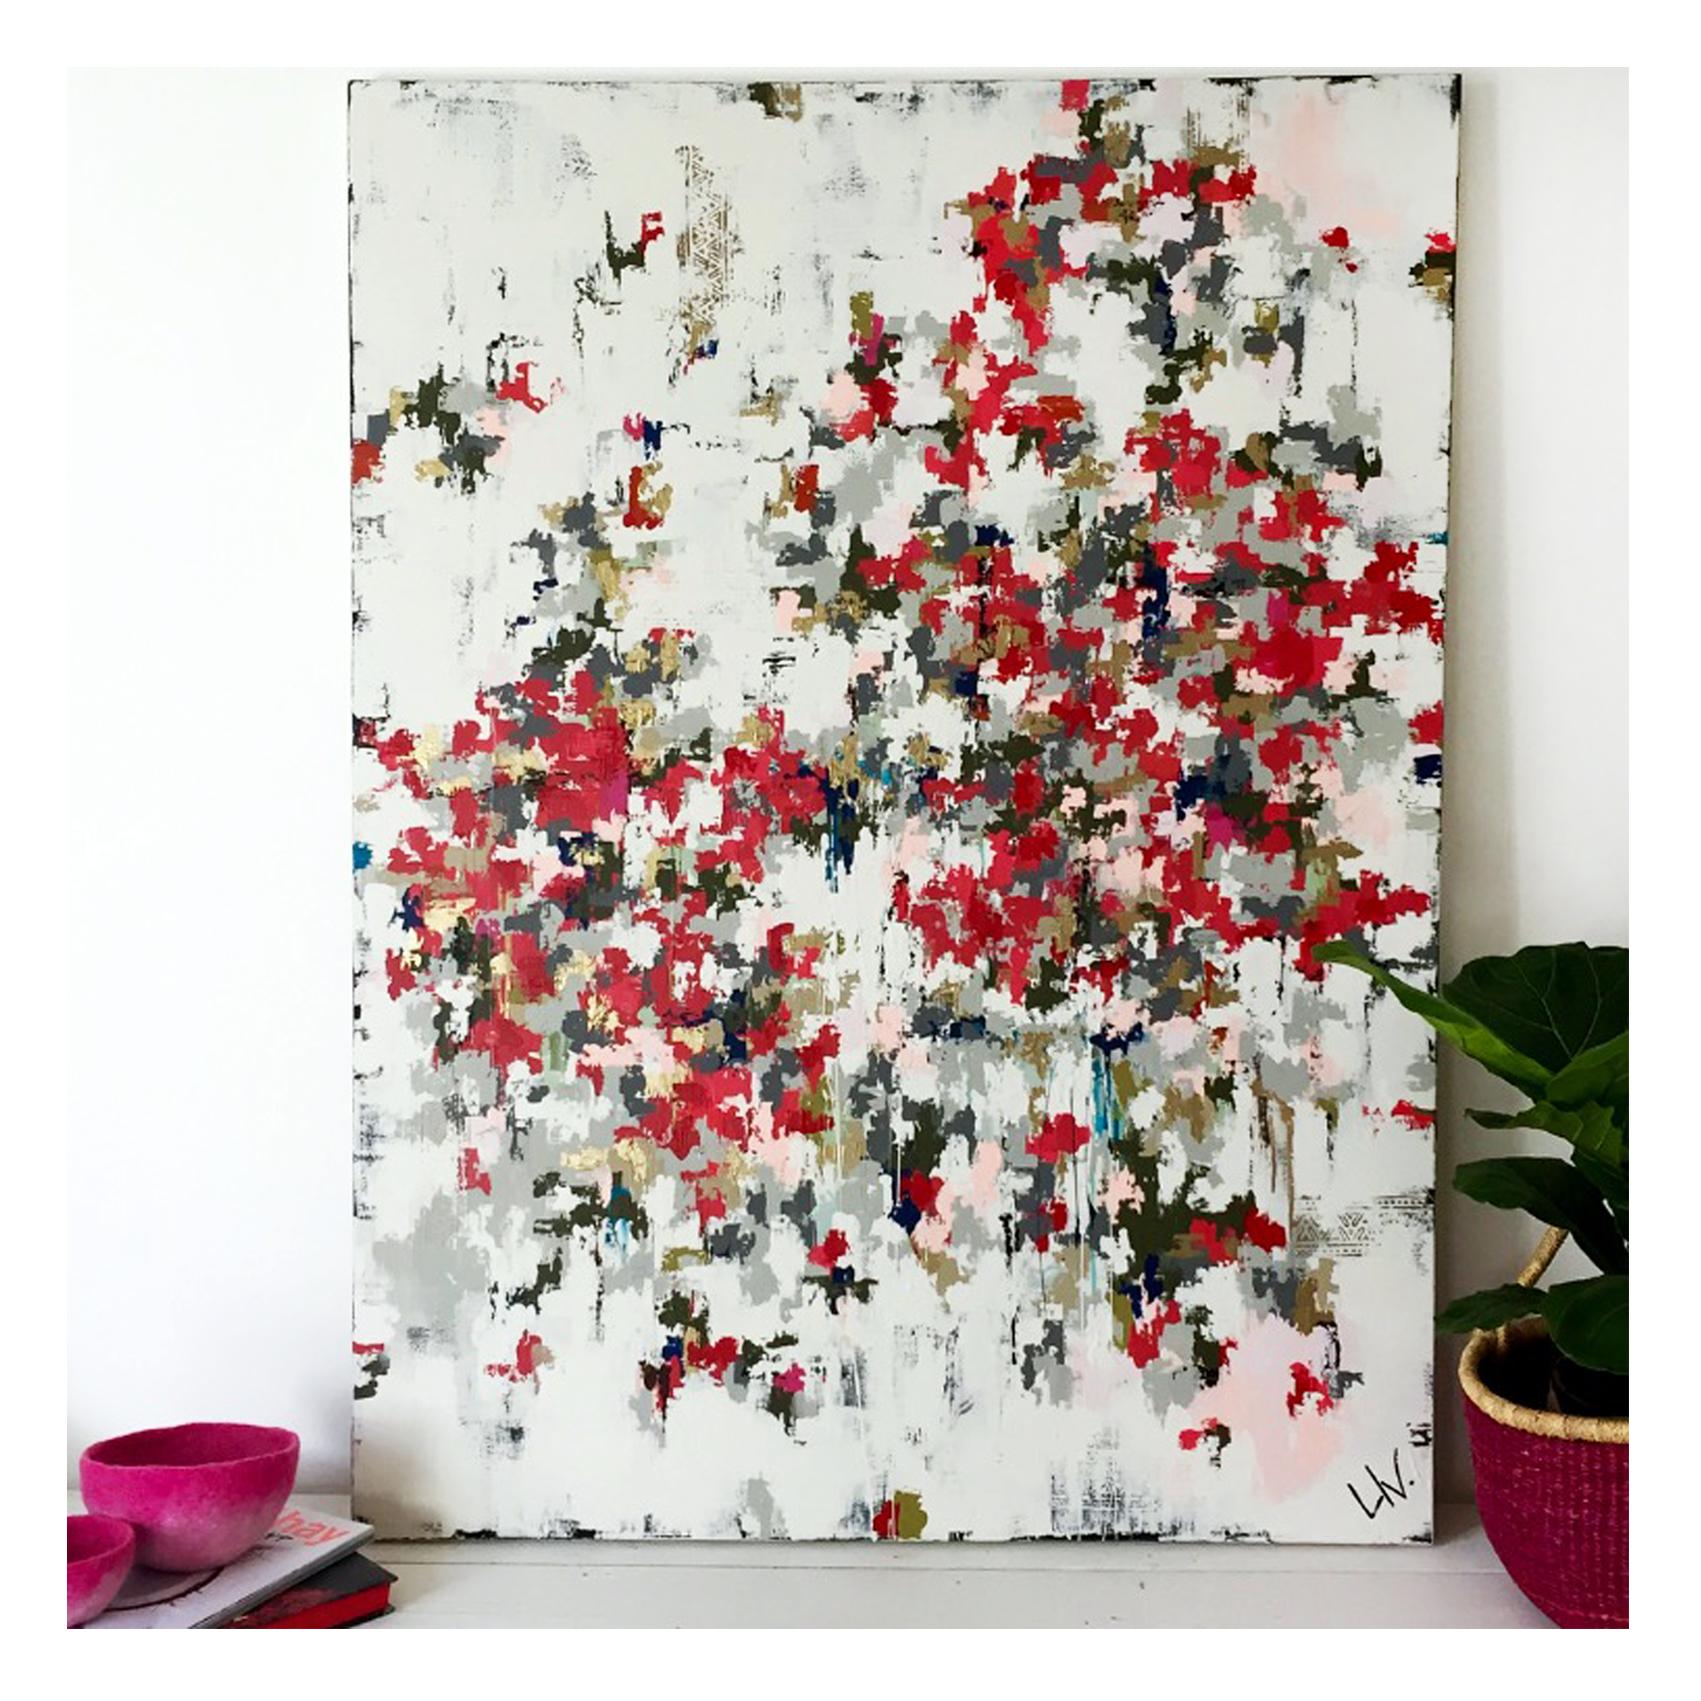 'gum blossom' (sold)